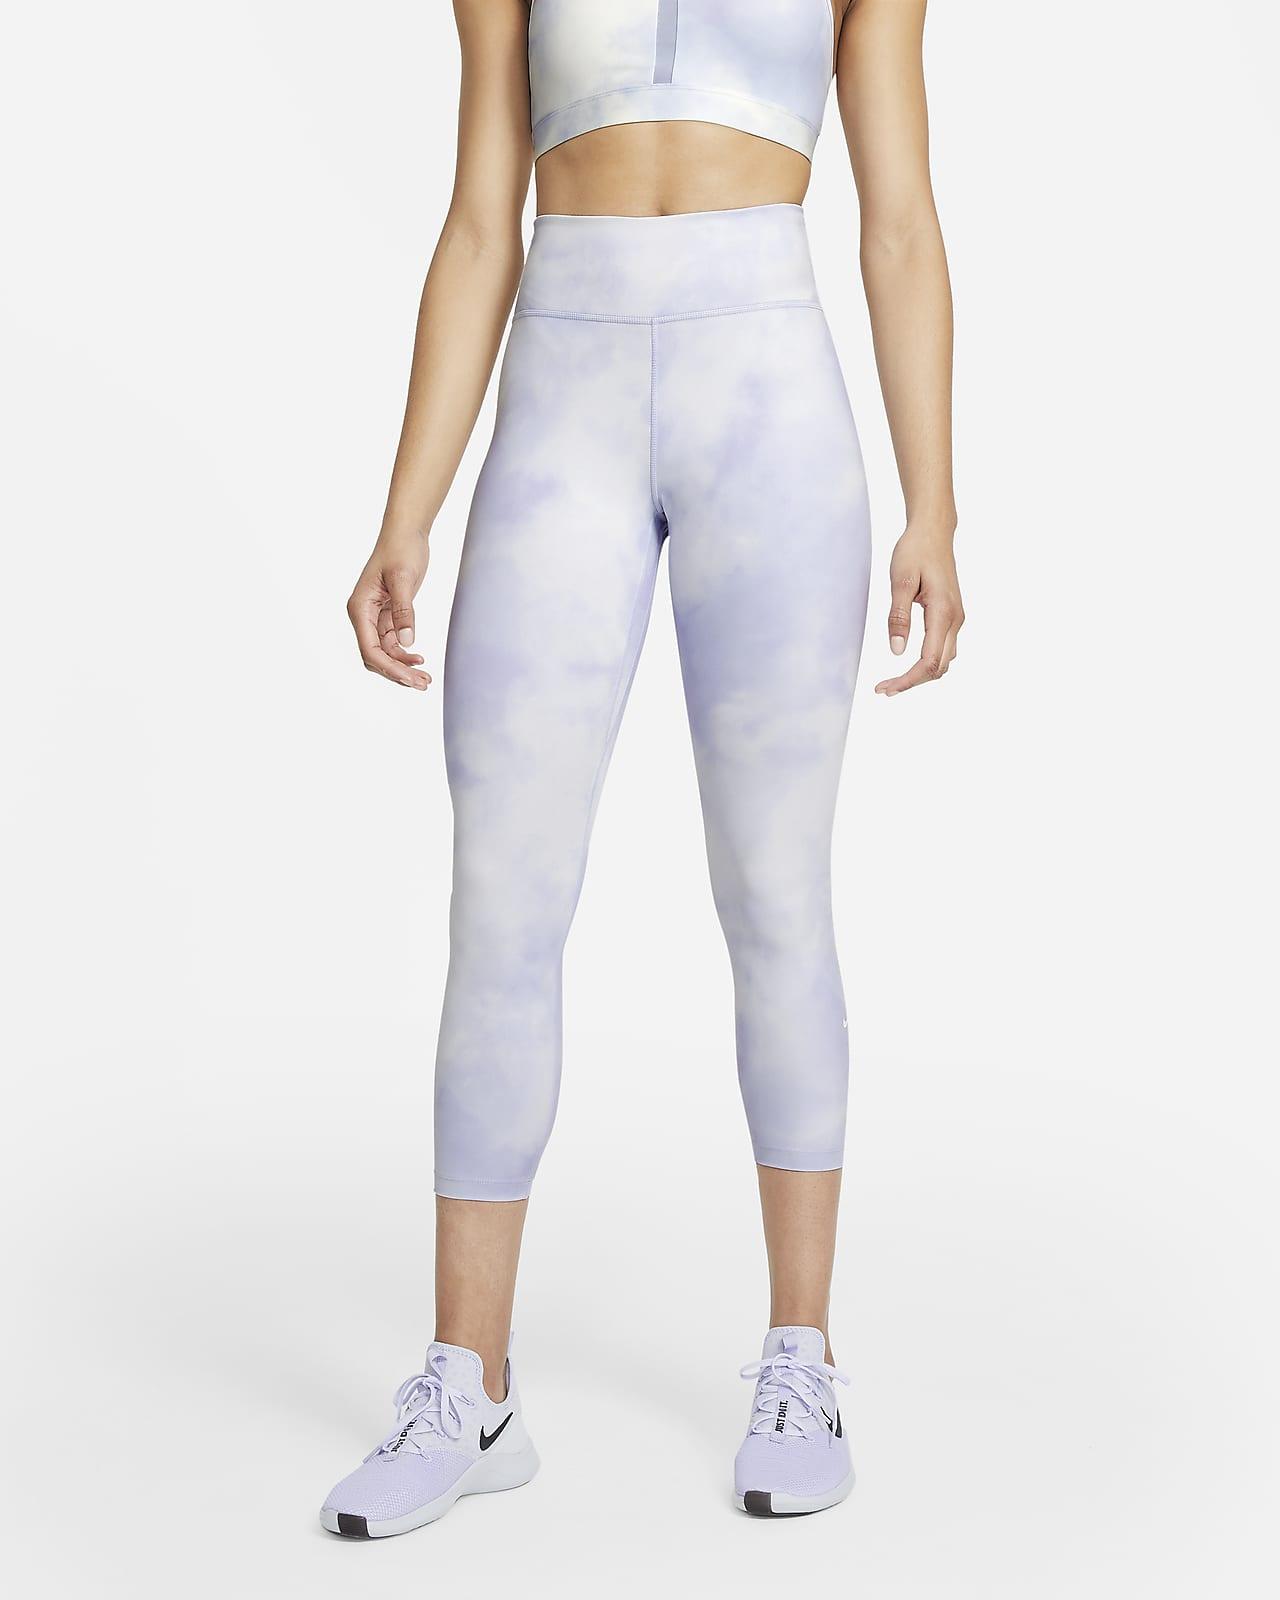 Nike One Icon Clash Women's Mid-Rise Crop Leggings